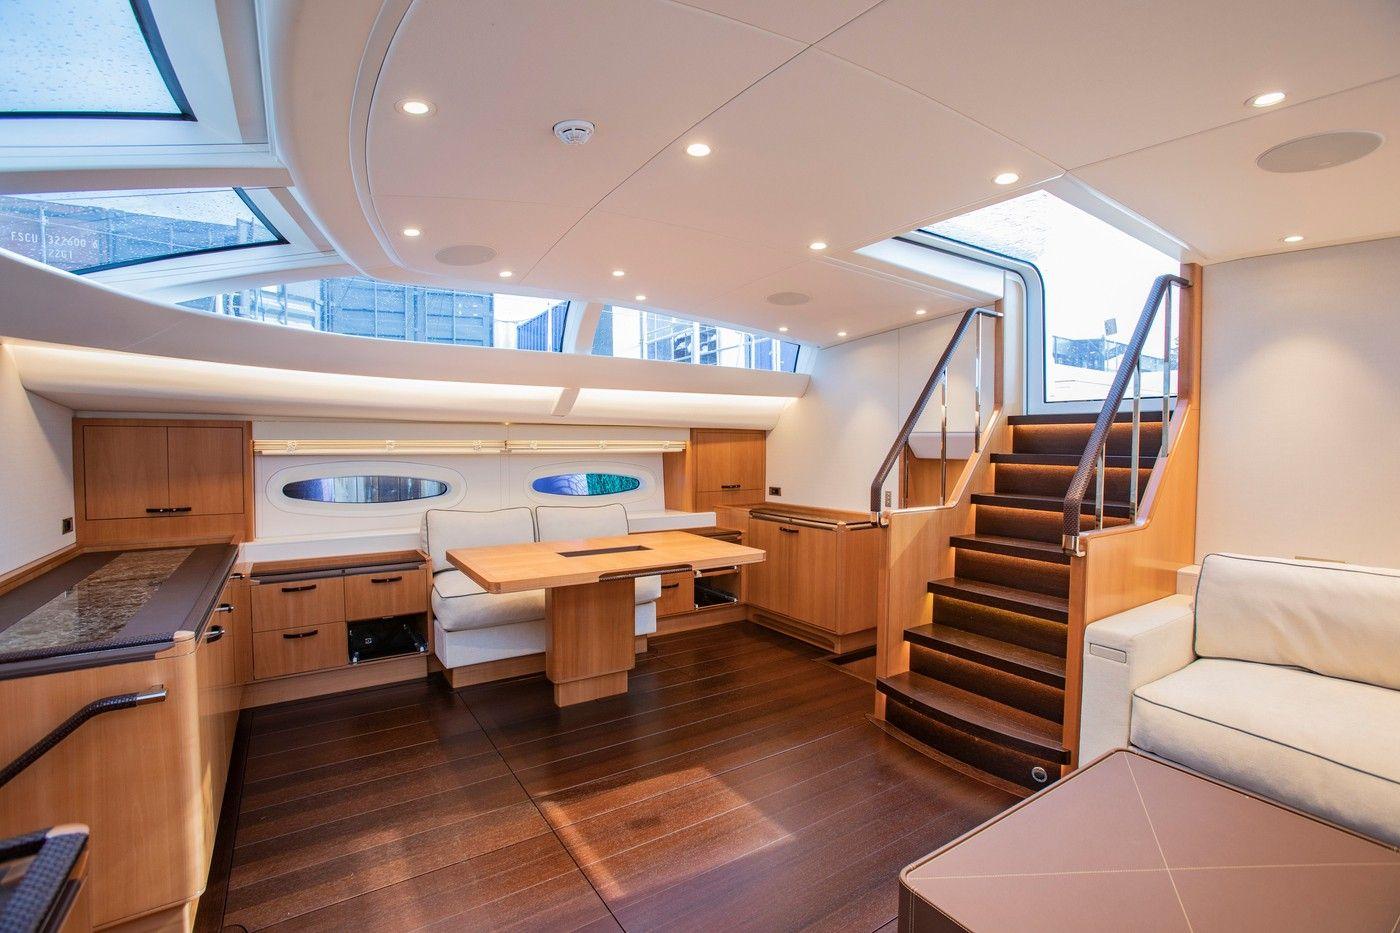 Baltic 85 Custom Mini Y Yacht With Interior Photos